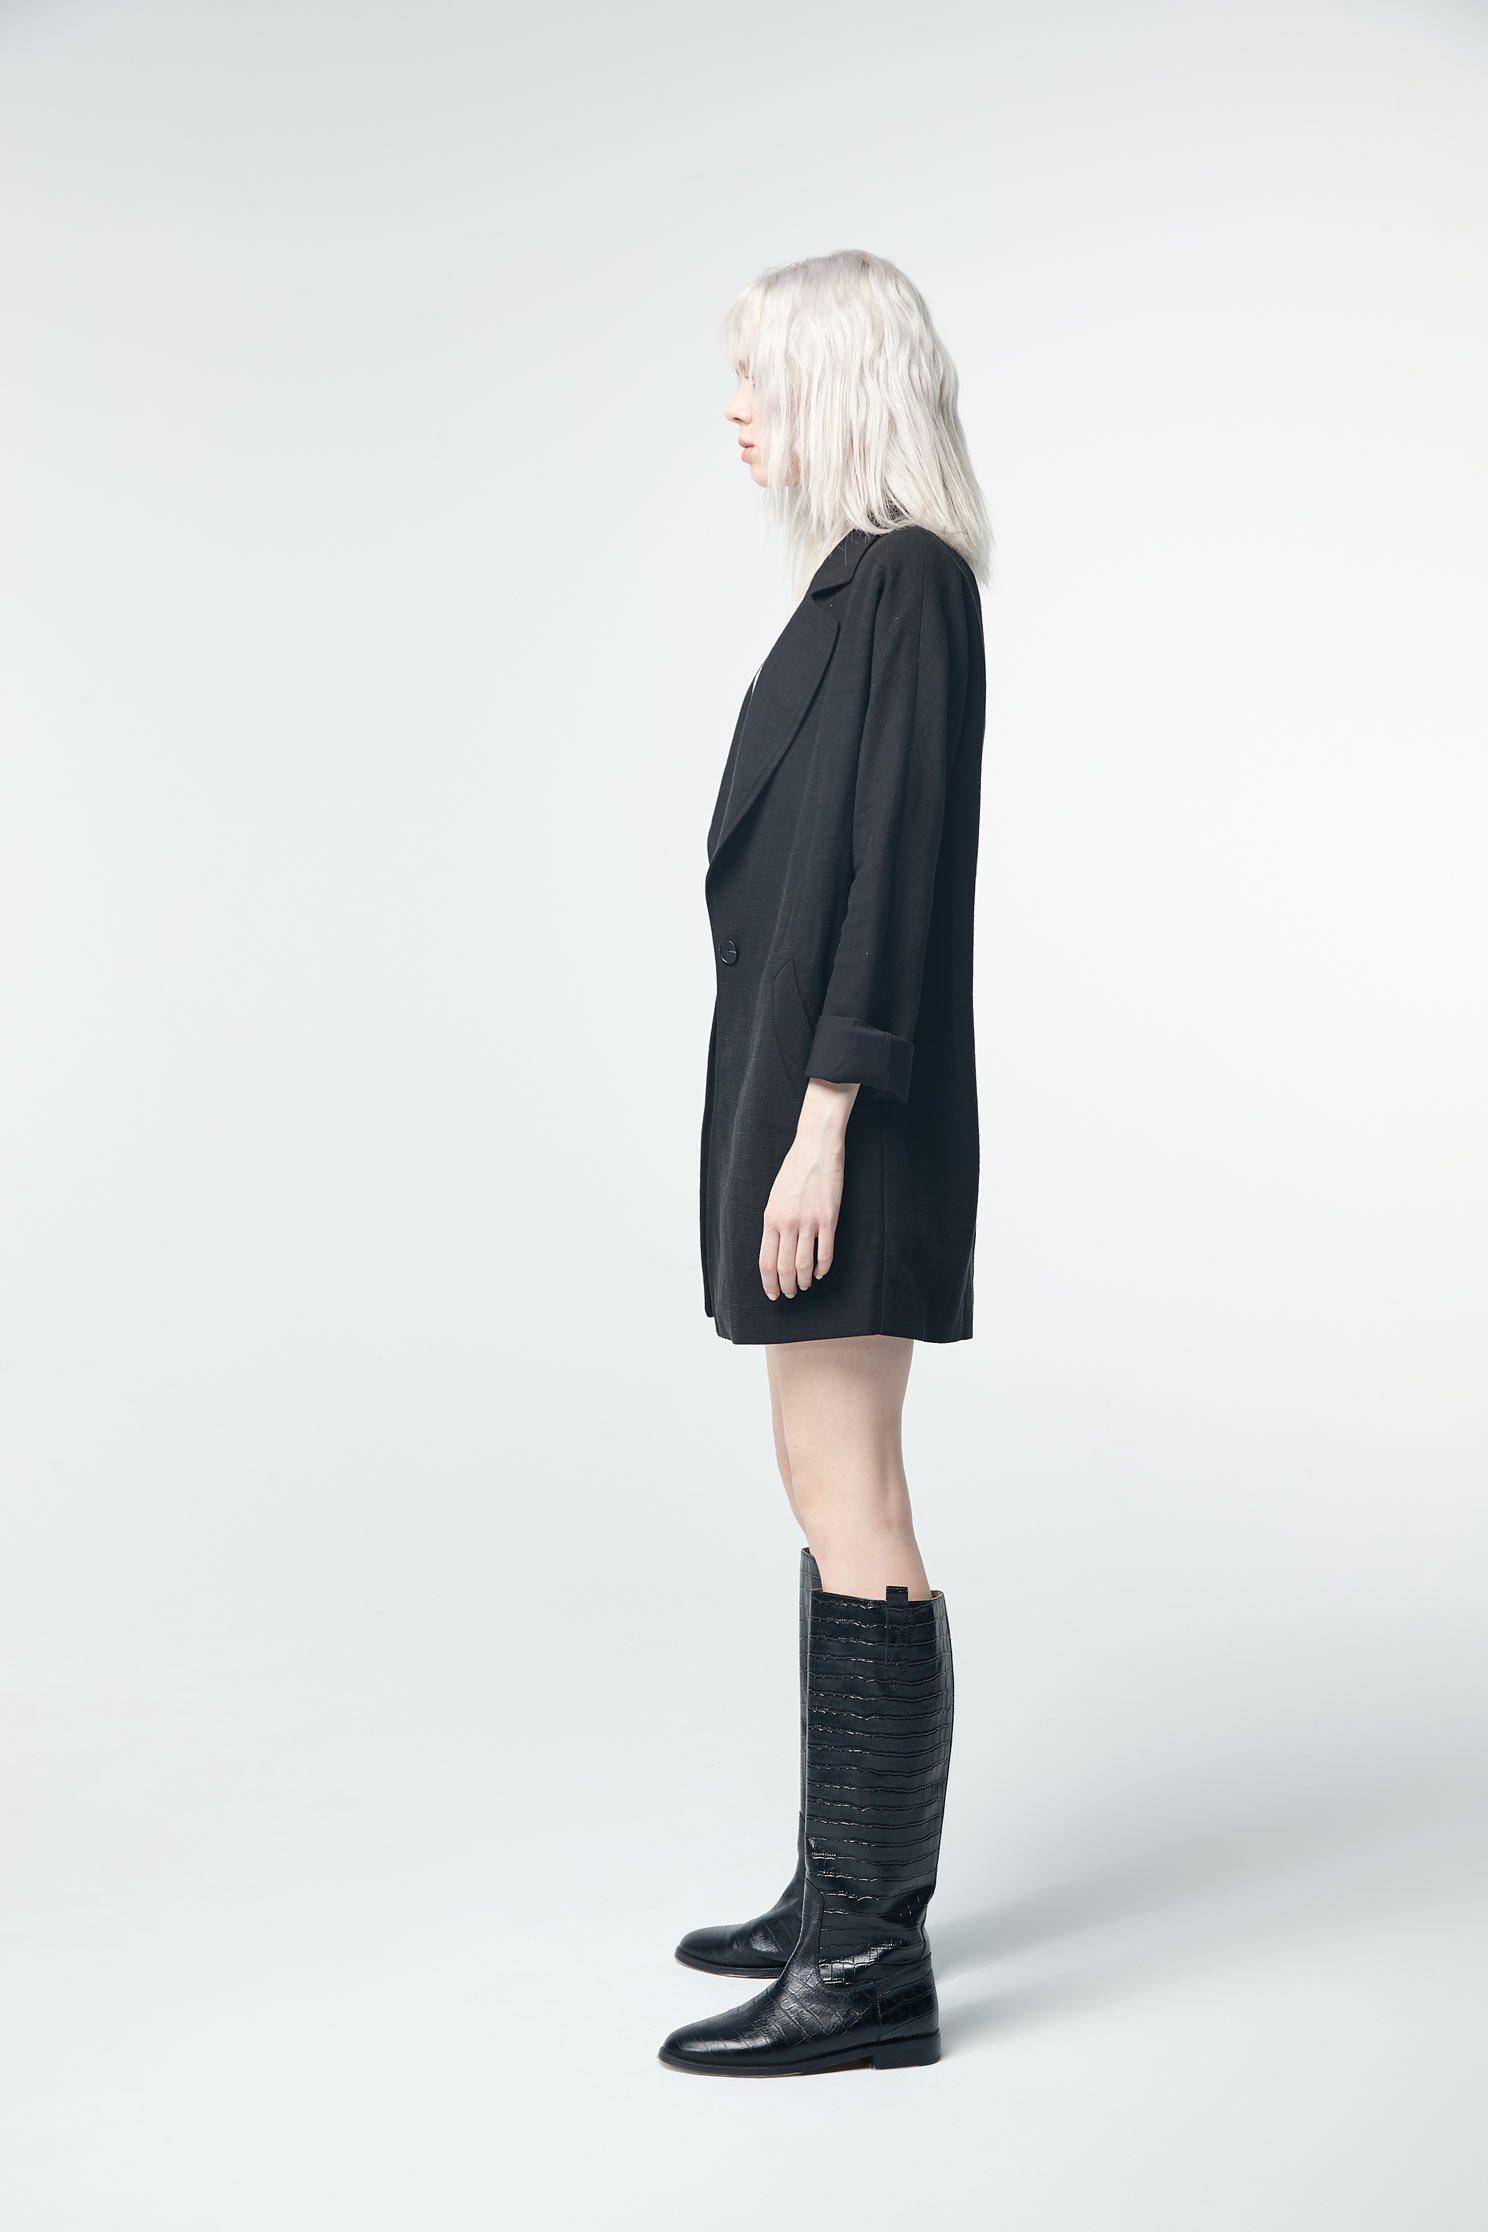 Cotton suit jacket,Outerwear,Season (SS) Look,Season (AW) Look,i Select,Blazers,Long sleeve outerwear,Black outerwear